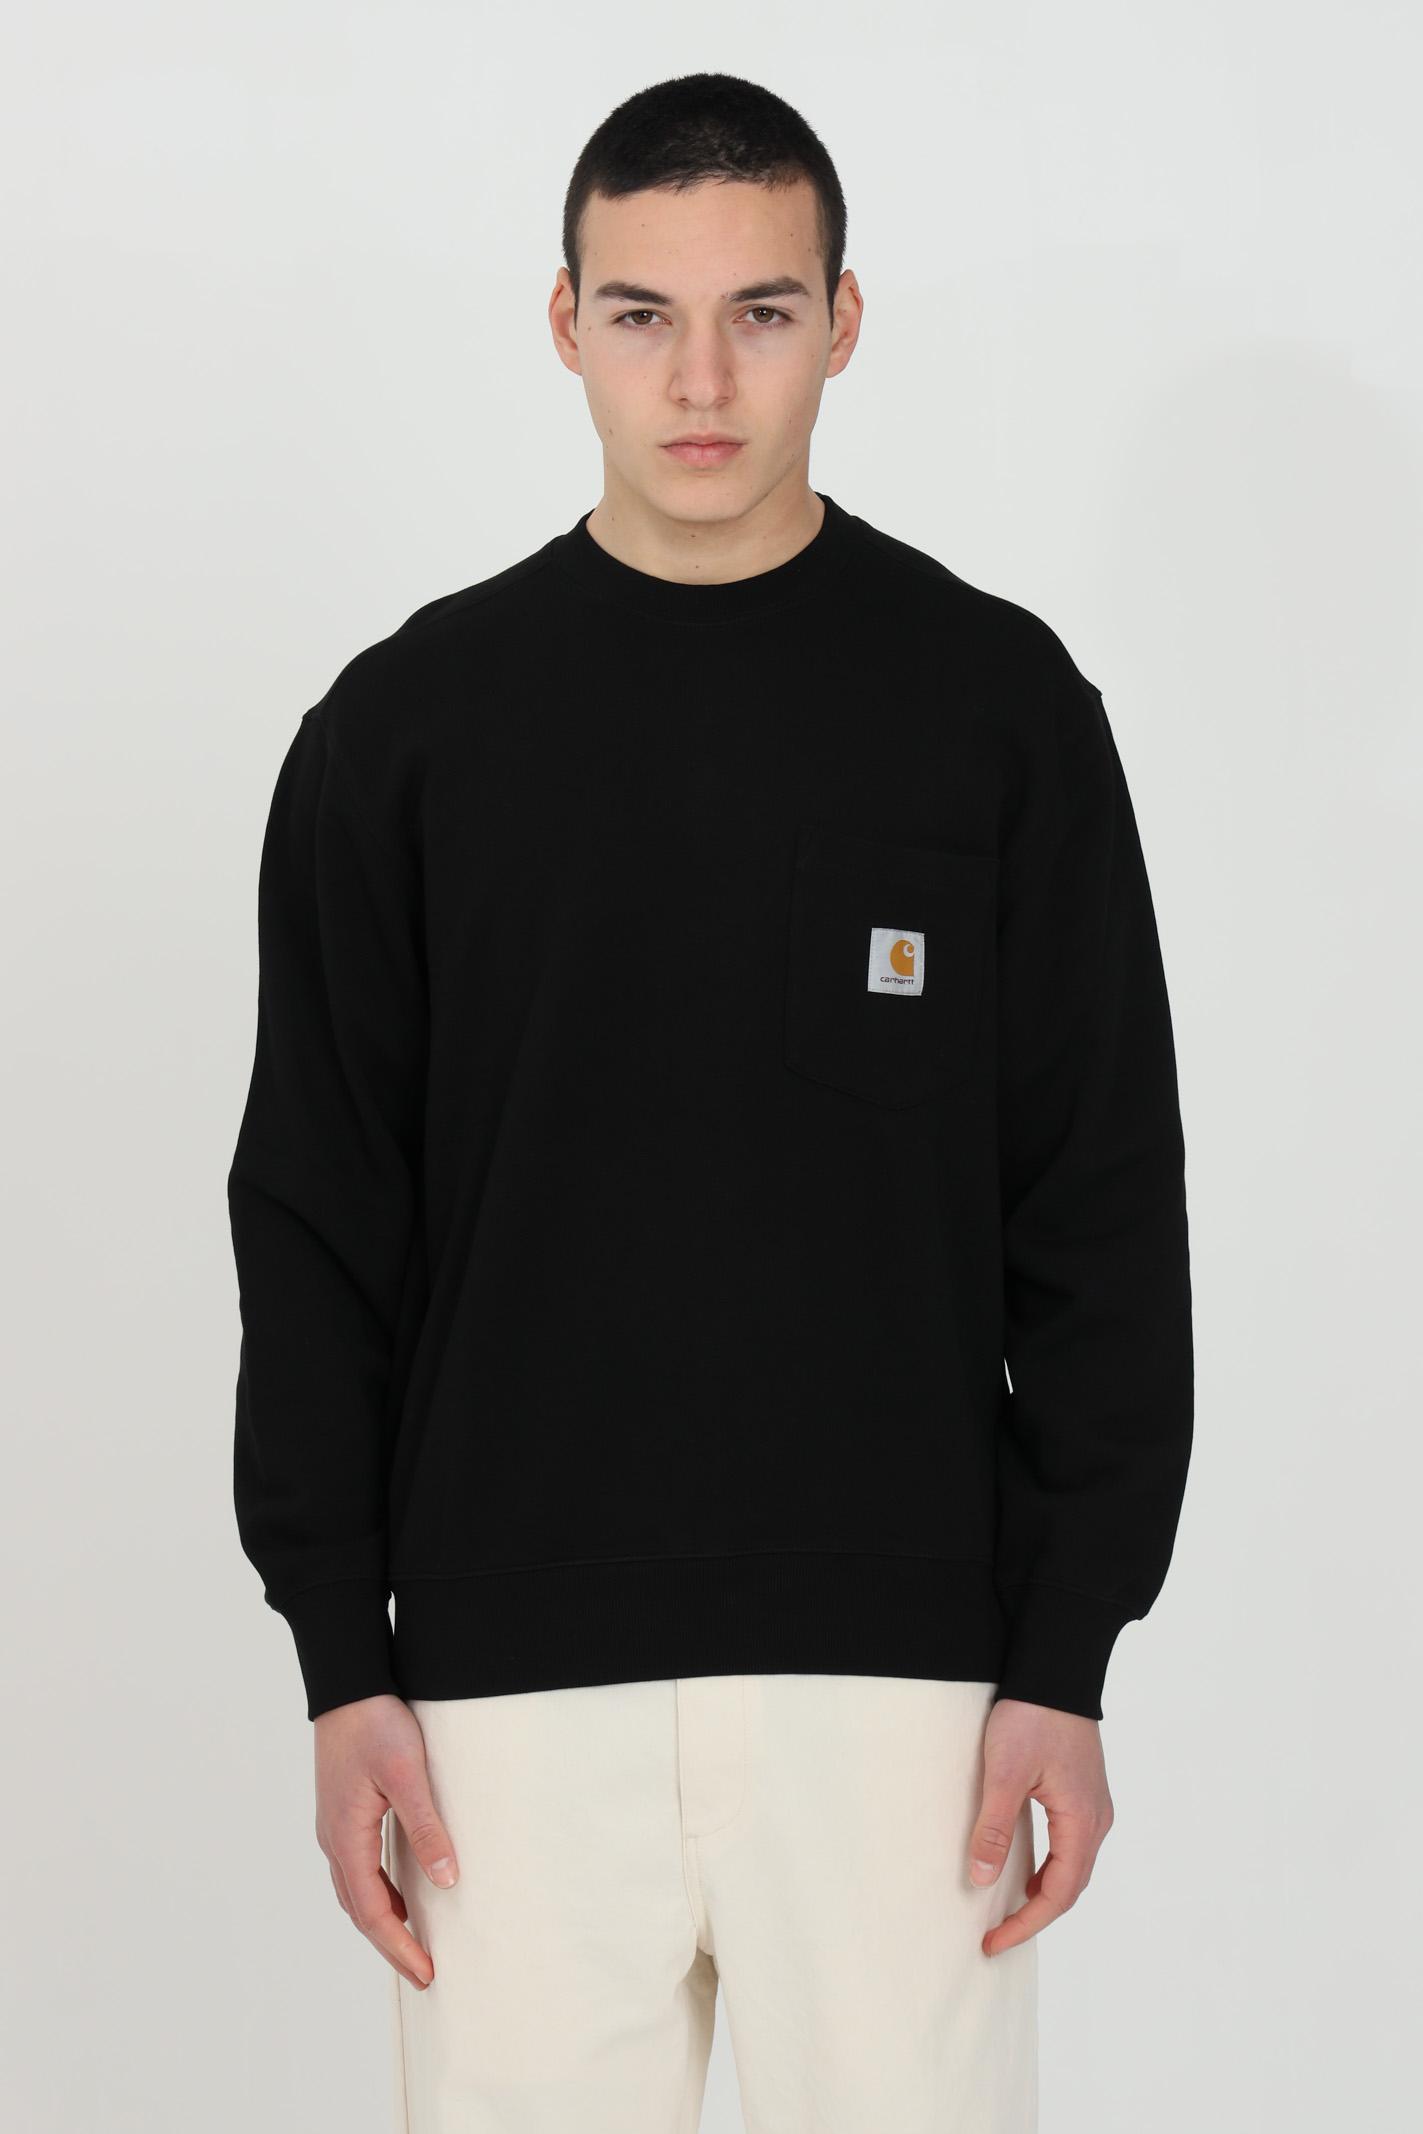 Felpa Pocket Sweatshirt uomo nero carhartt girocollo CARHARTT | Felpe | I027681.0389.00